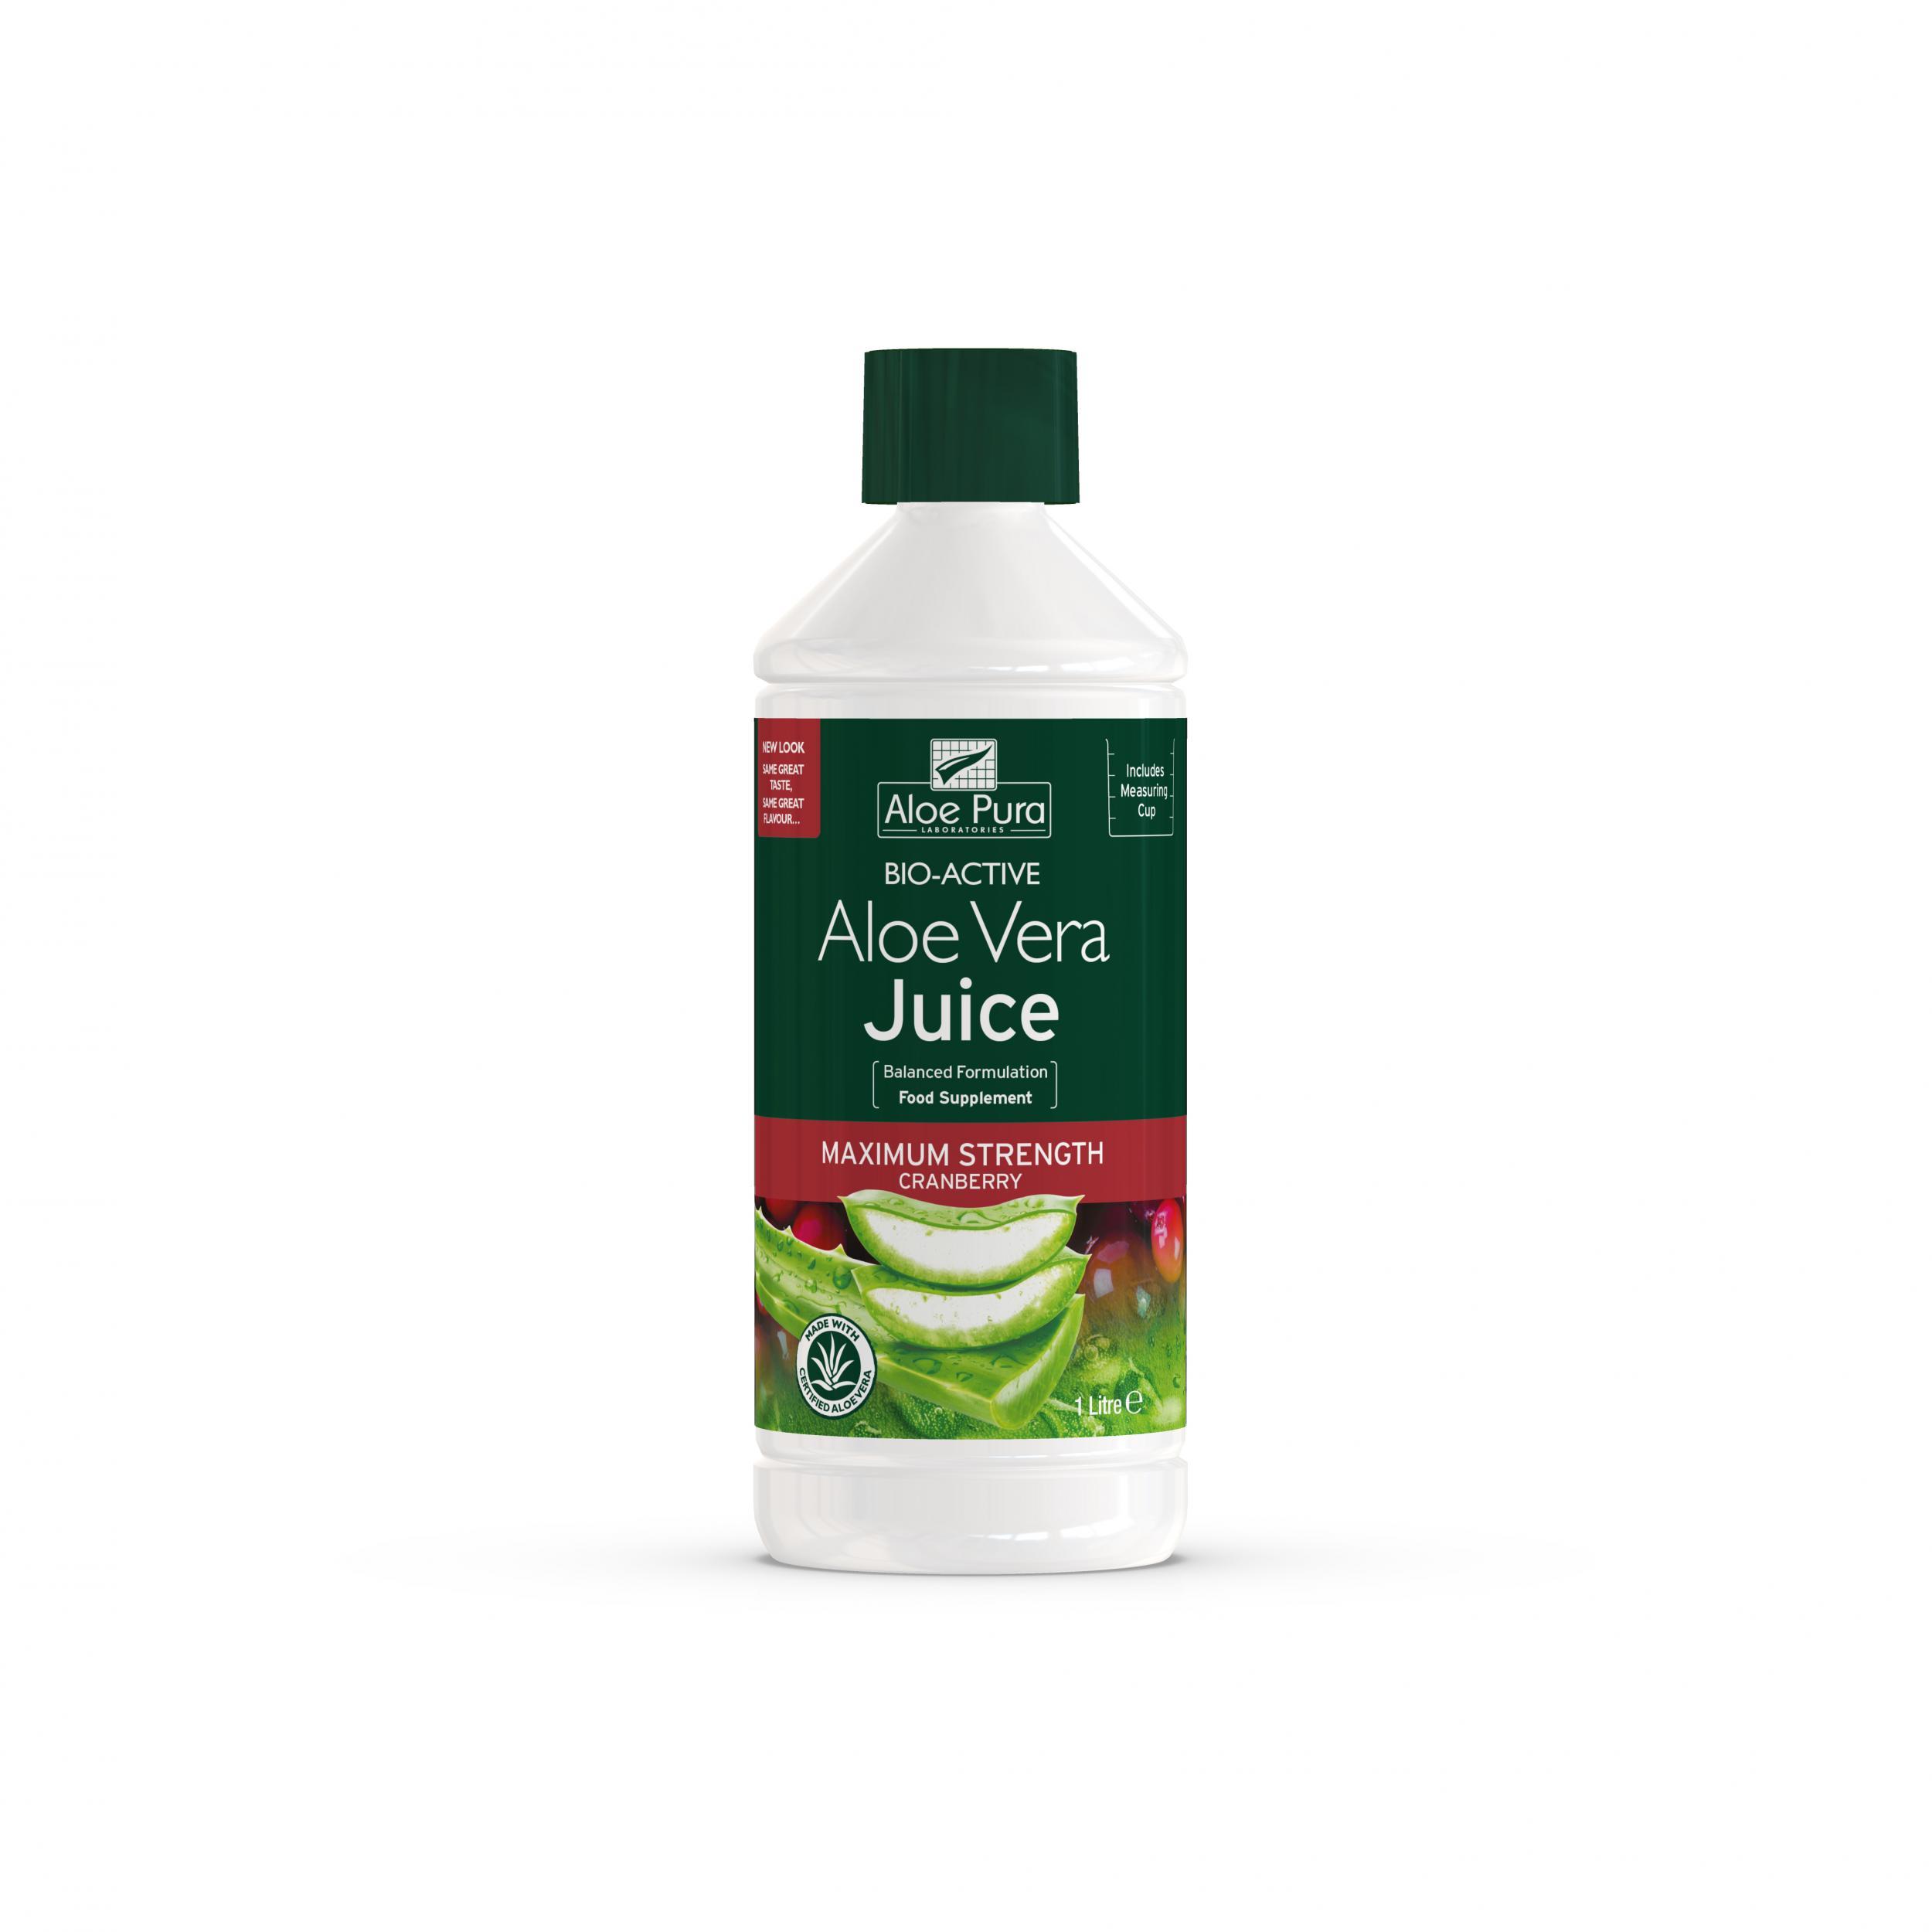 Aloe Vera Juice Maximum Strength Cranberry 1ltr